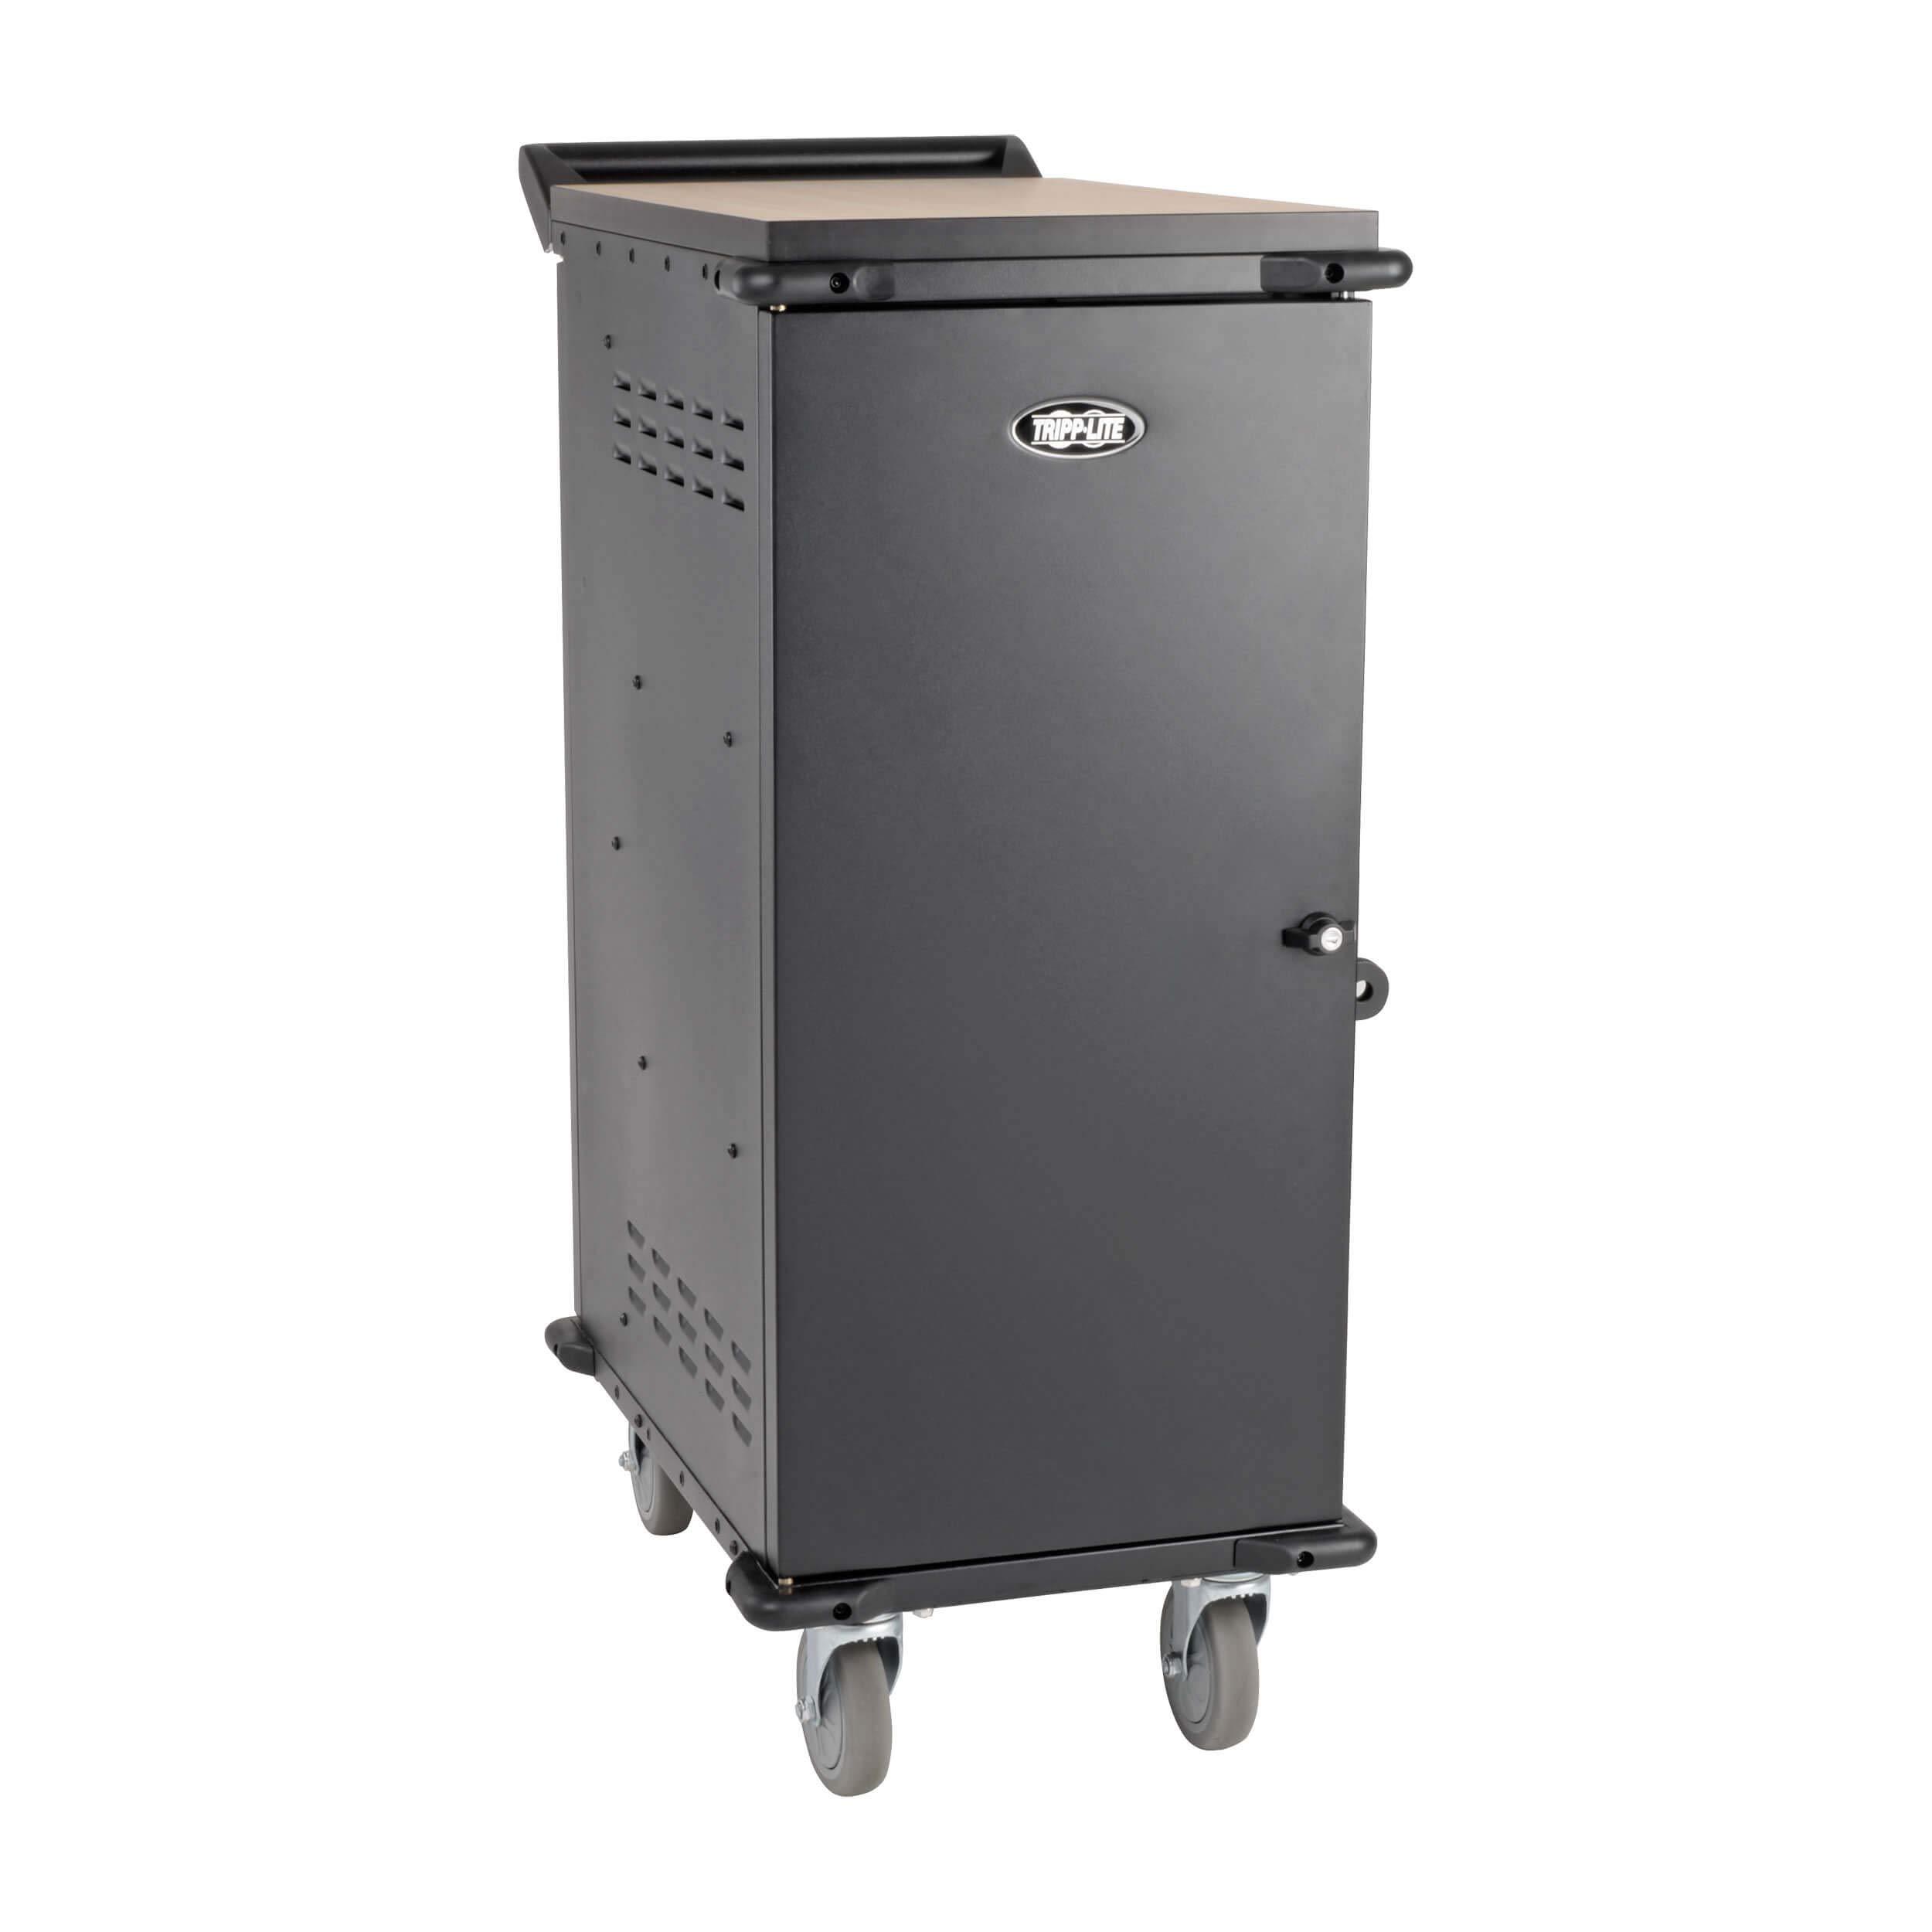 Tripp Lite 27-Port AC Mobile Charging Cart Storage Station for Chromebooks, iPads, Laptops, Tablets, Black (CSC27AC) by Tripp Lite (Image #9)